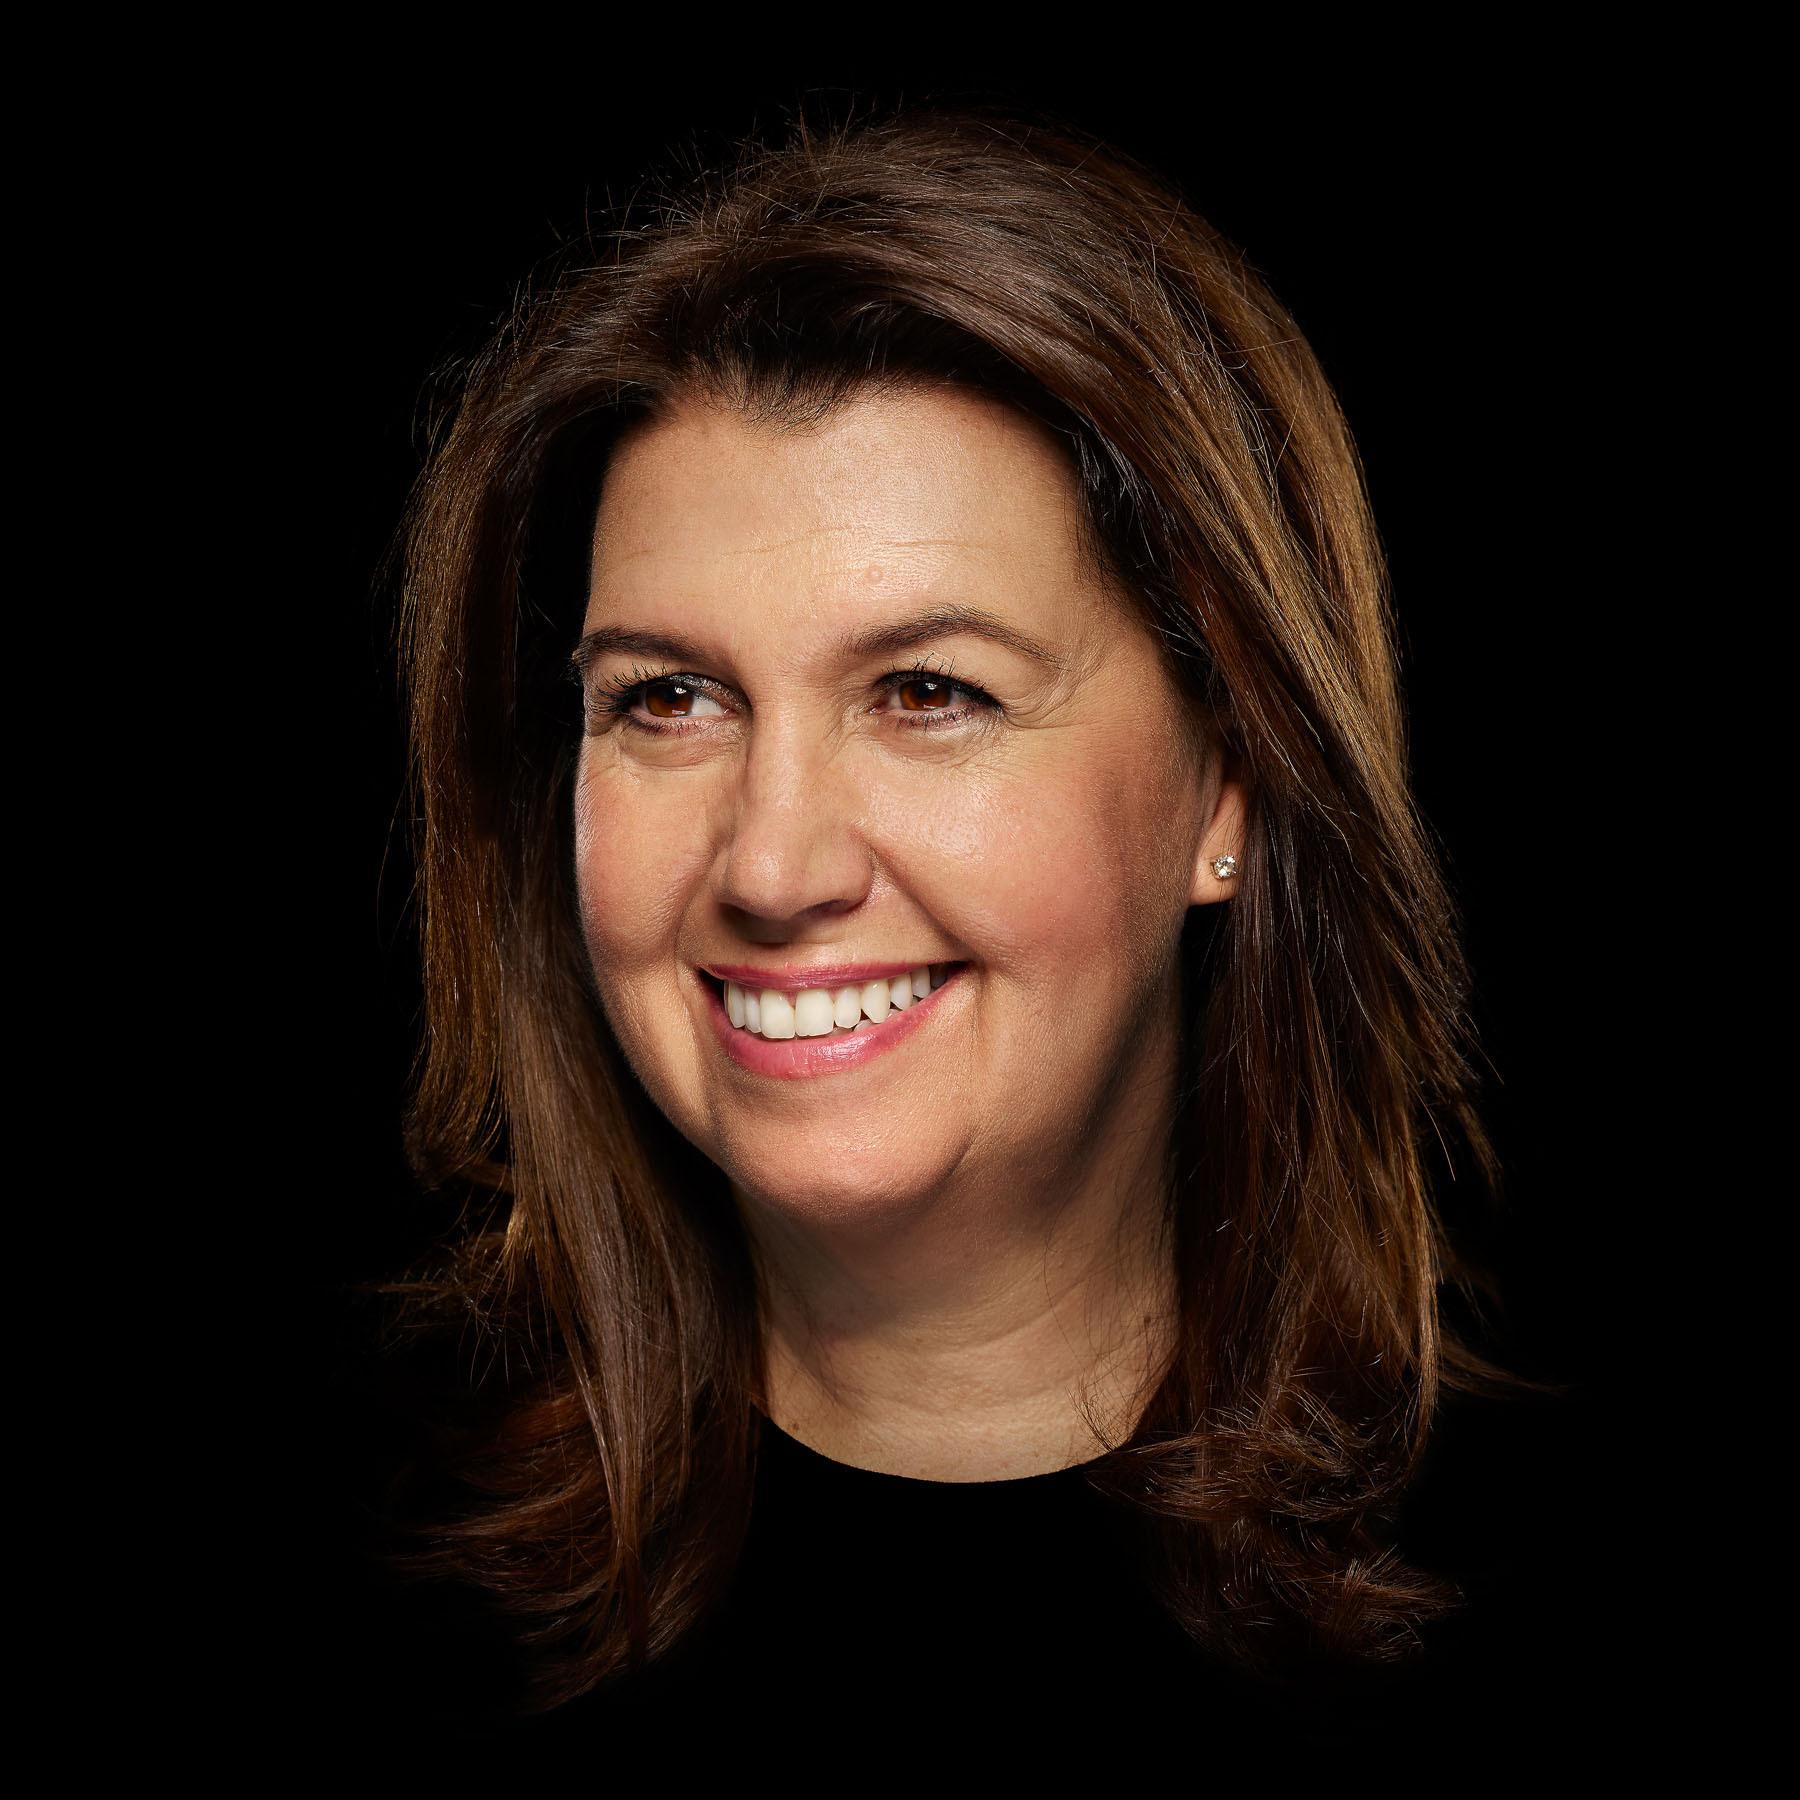 Sarah Hague FLT